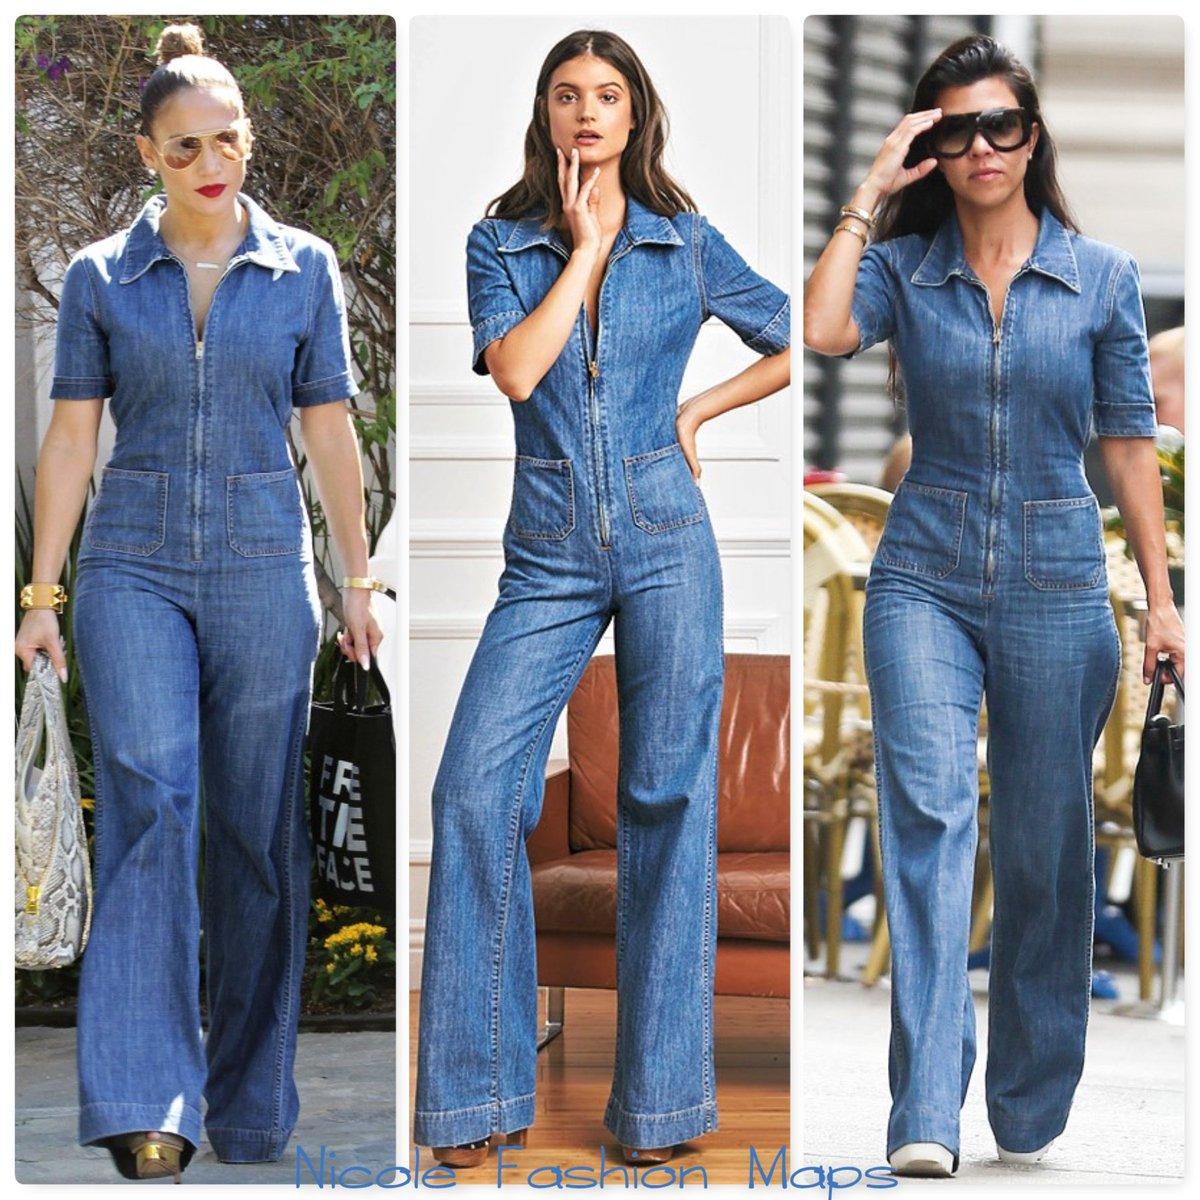 43627408da31  Majorelle  majorelle  asos  chicpieces  modernmuse  women  clothing   Revolve  denim  denimrevolution  Jumpsuit  casualoutfit  streetlook   streetstyle ...